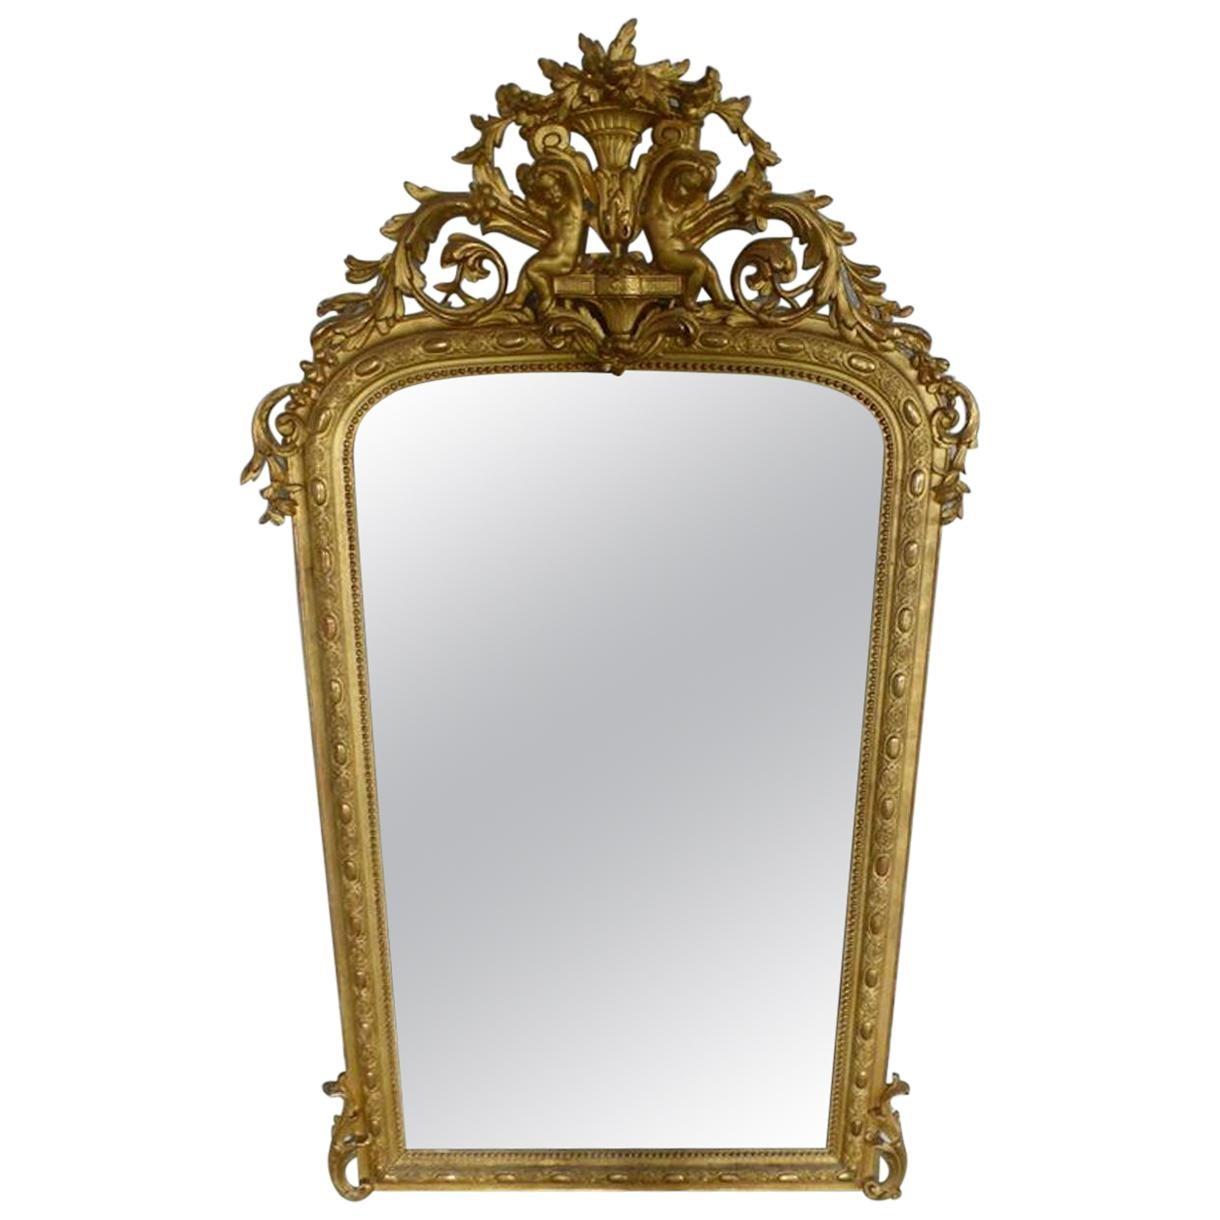 19th Century French Napoleon III Period Mirror